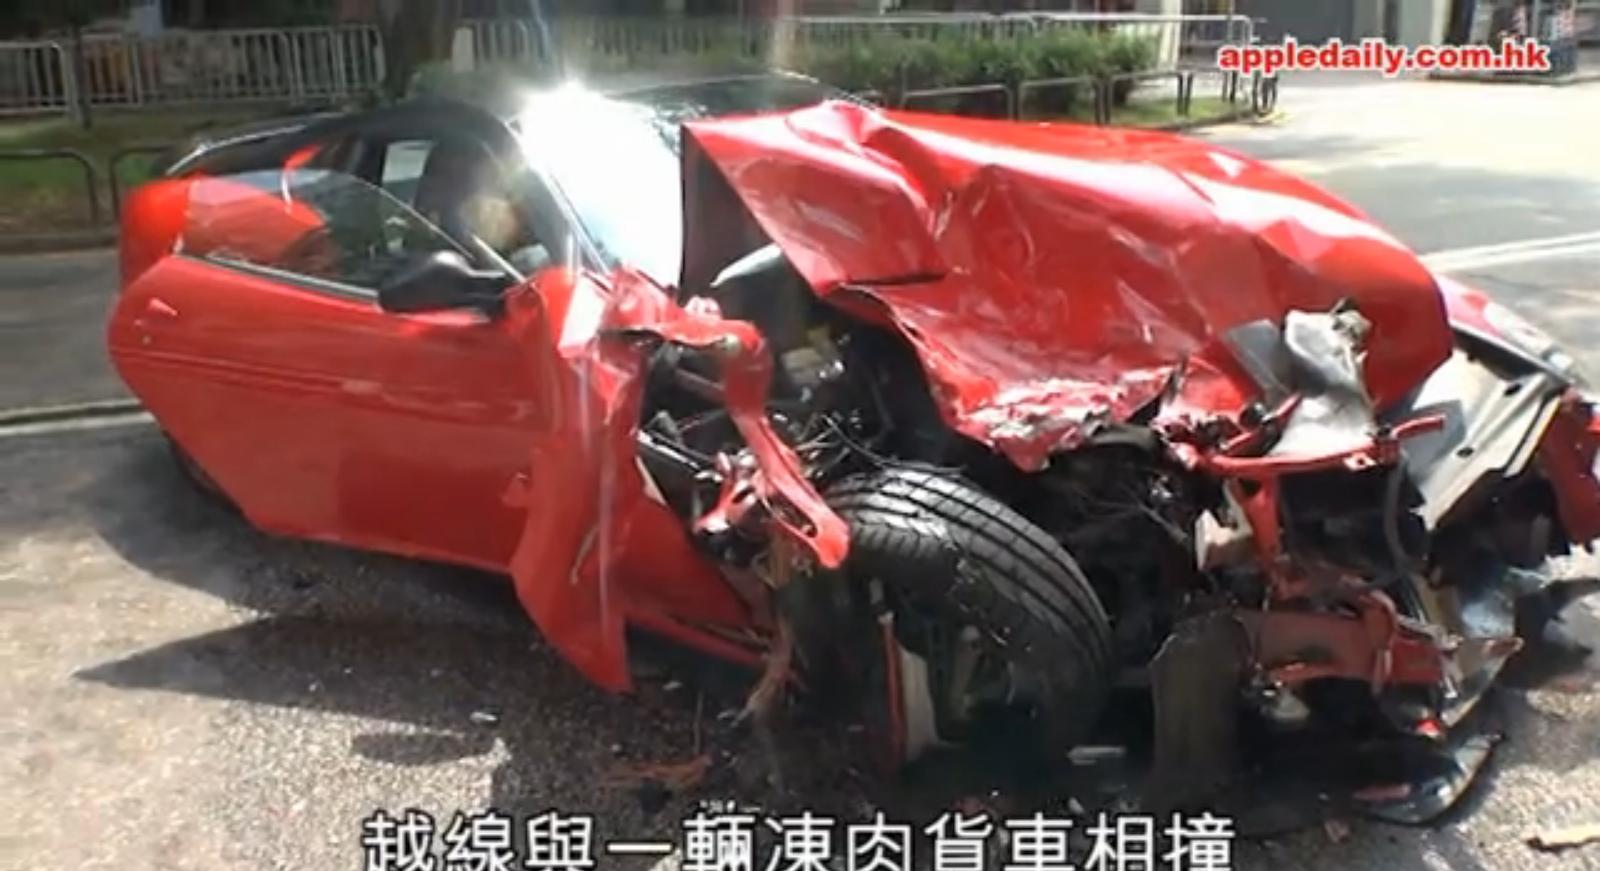 Was Paul Walker Porsche 911 Prone to Catch Fire in Crash